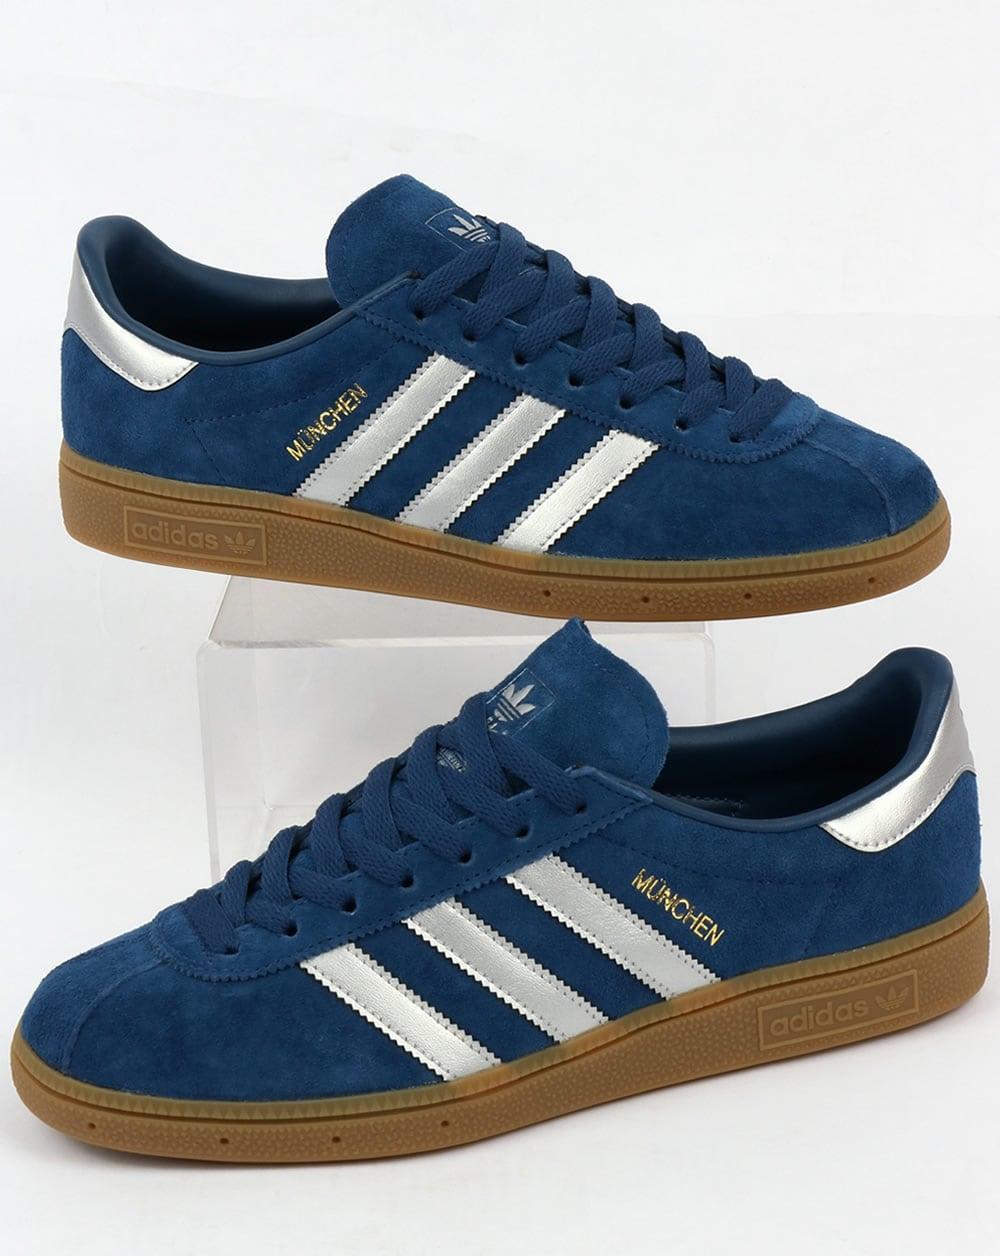 módulo Alexander Graham Bell Preocupado  Adidas Munchen Trainers Mystery Blue/Silver,originals,shoes,mens,sneakers